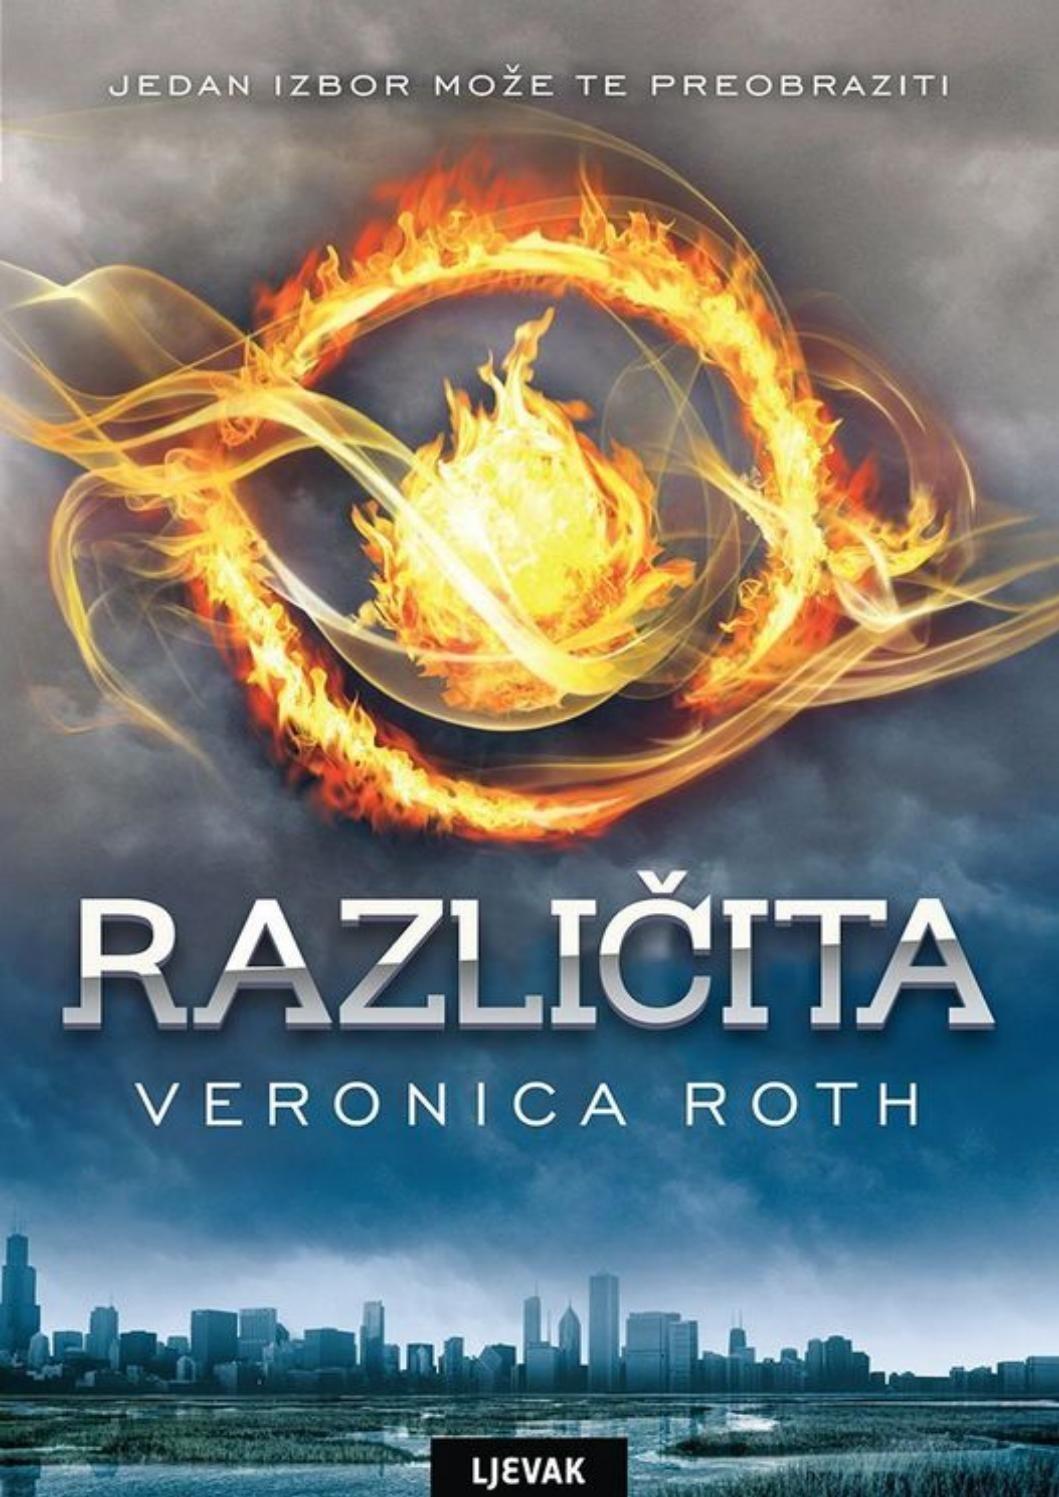 Razlicita Veronica Roth 1 Divergent Book Books For Tweens